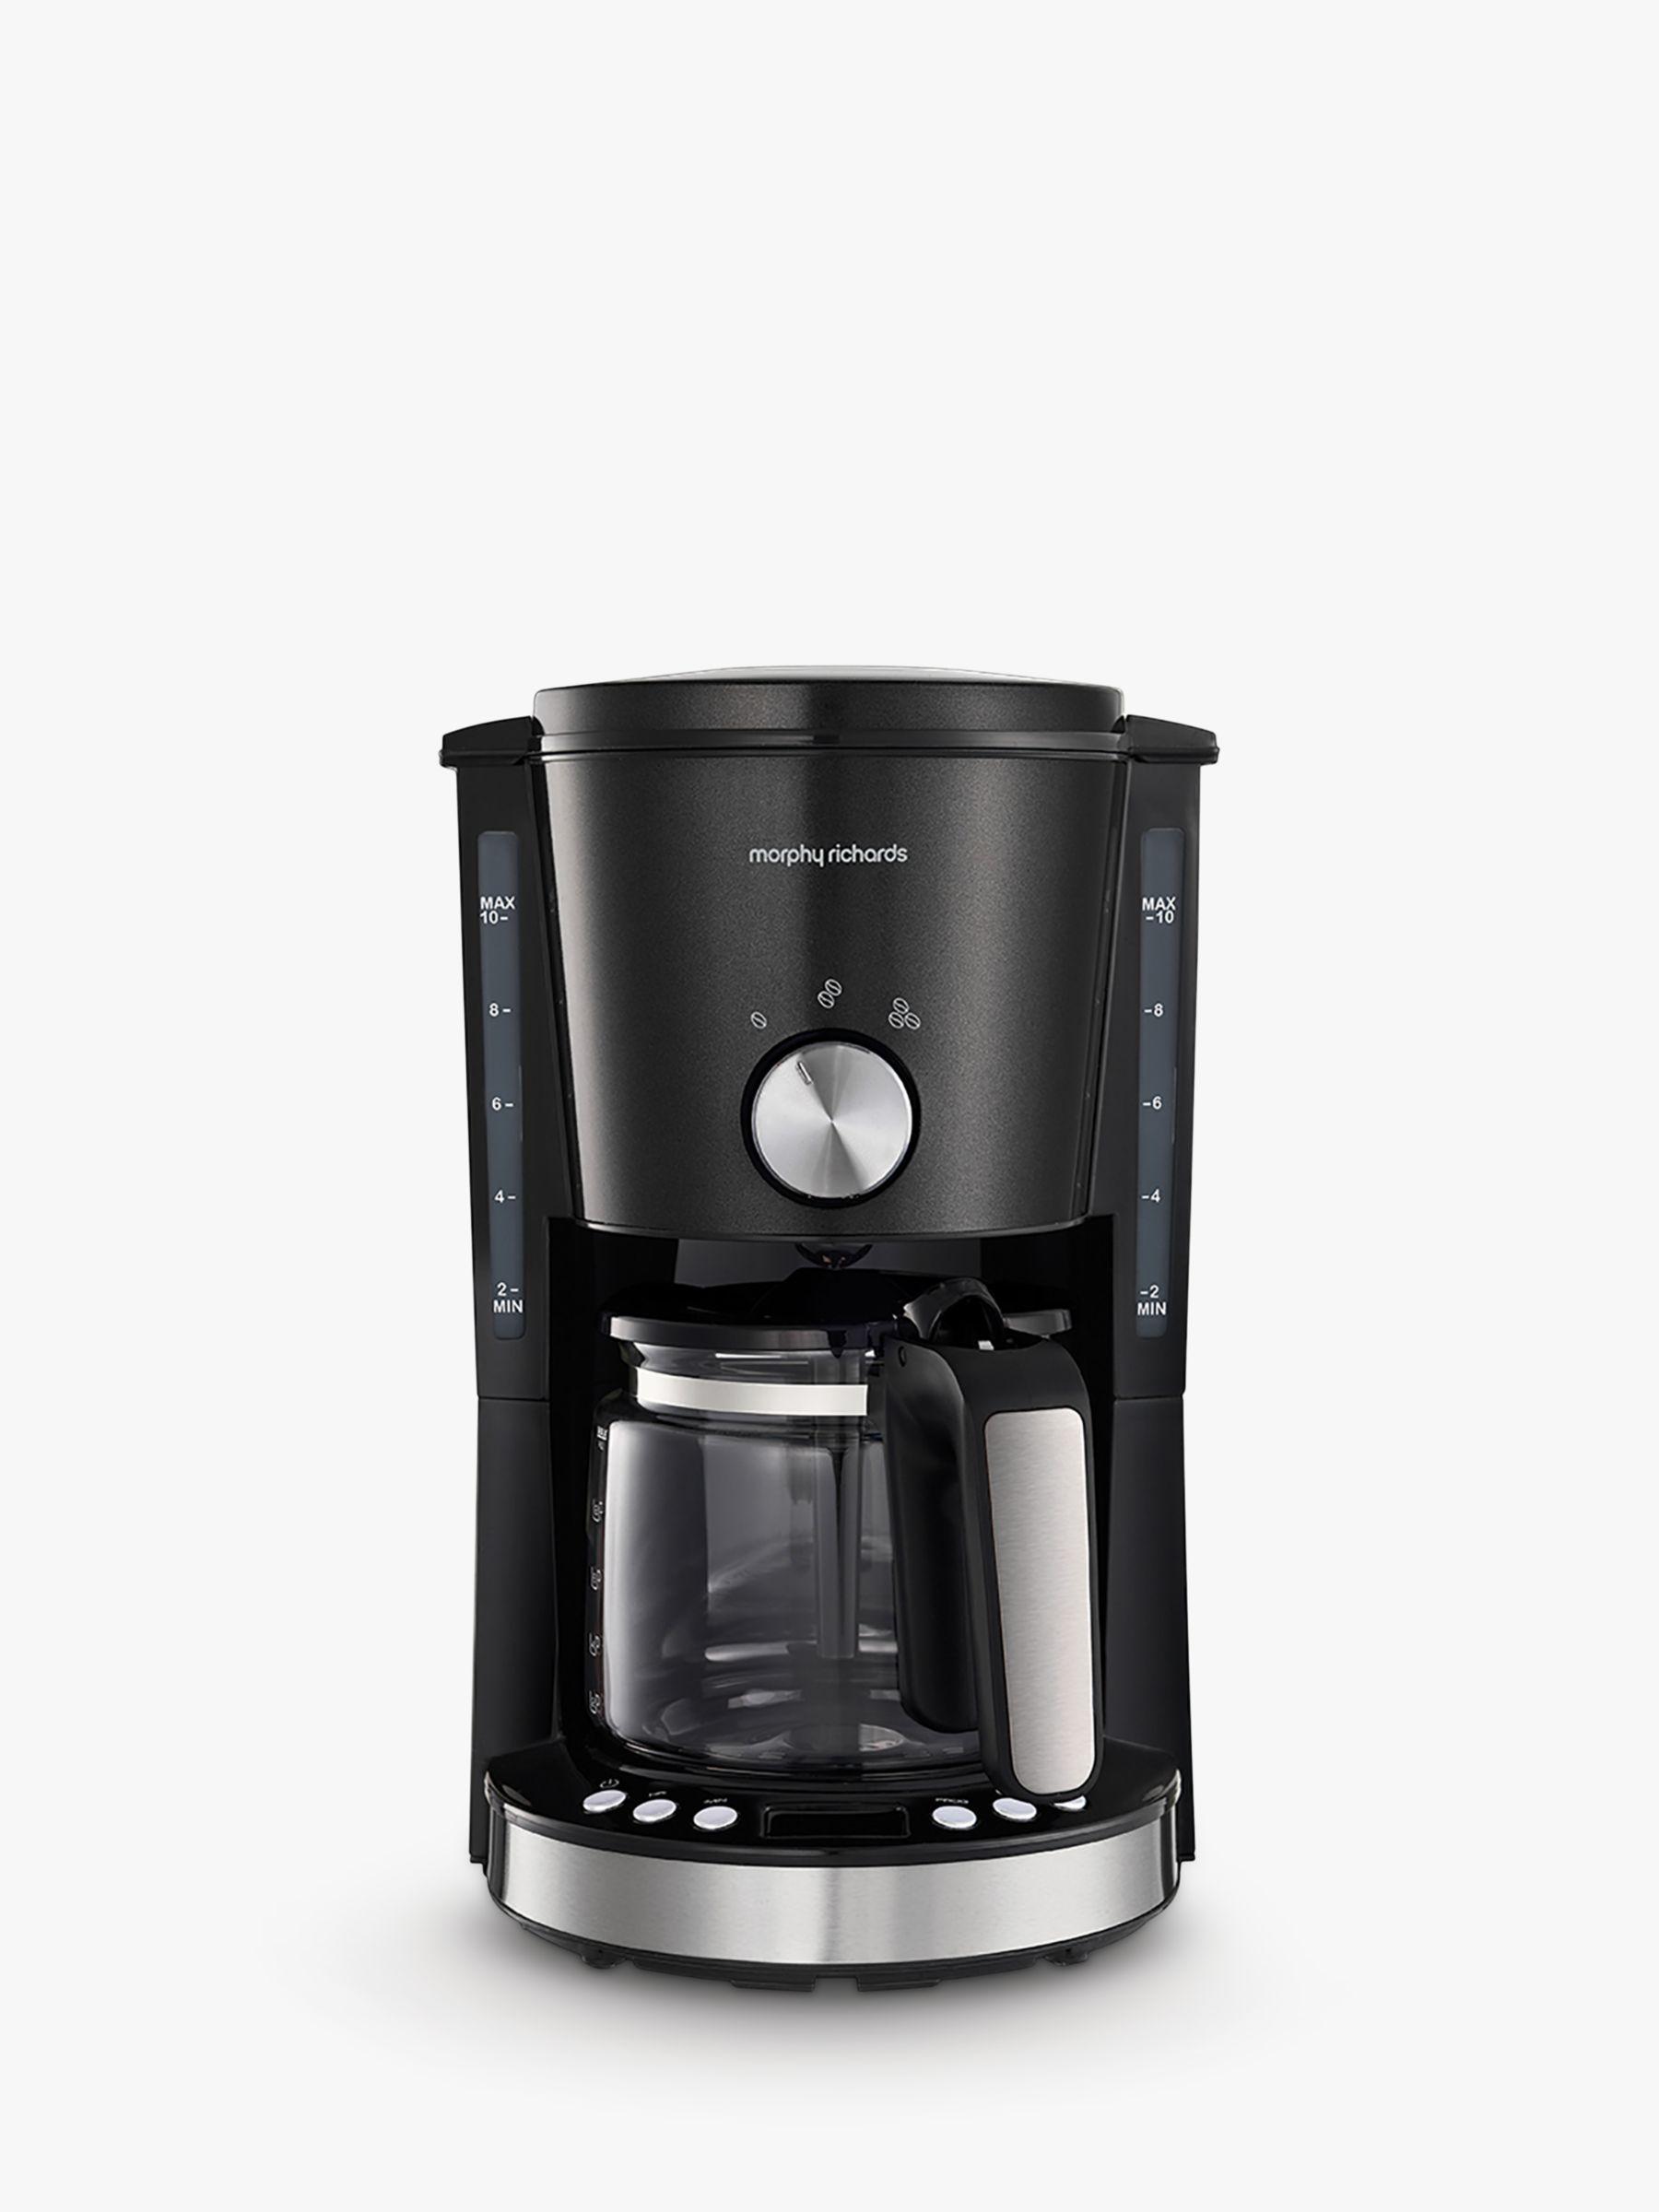 Morphy Richards Morphy Richards Evoke Filter Coffee Machine, Black